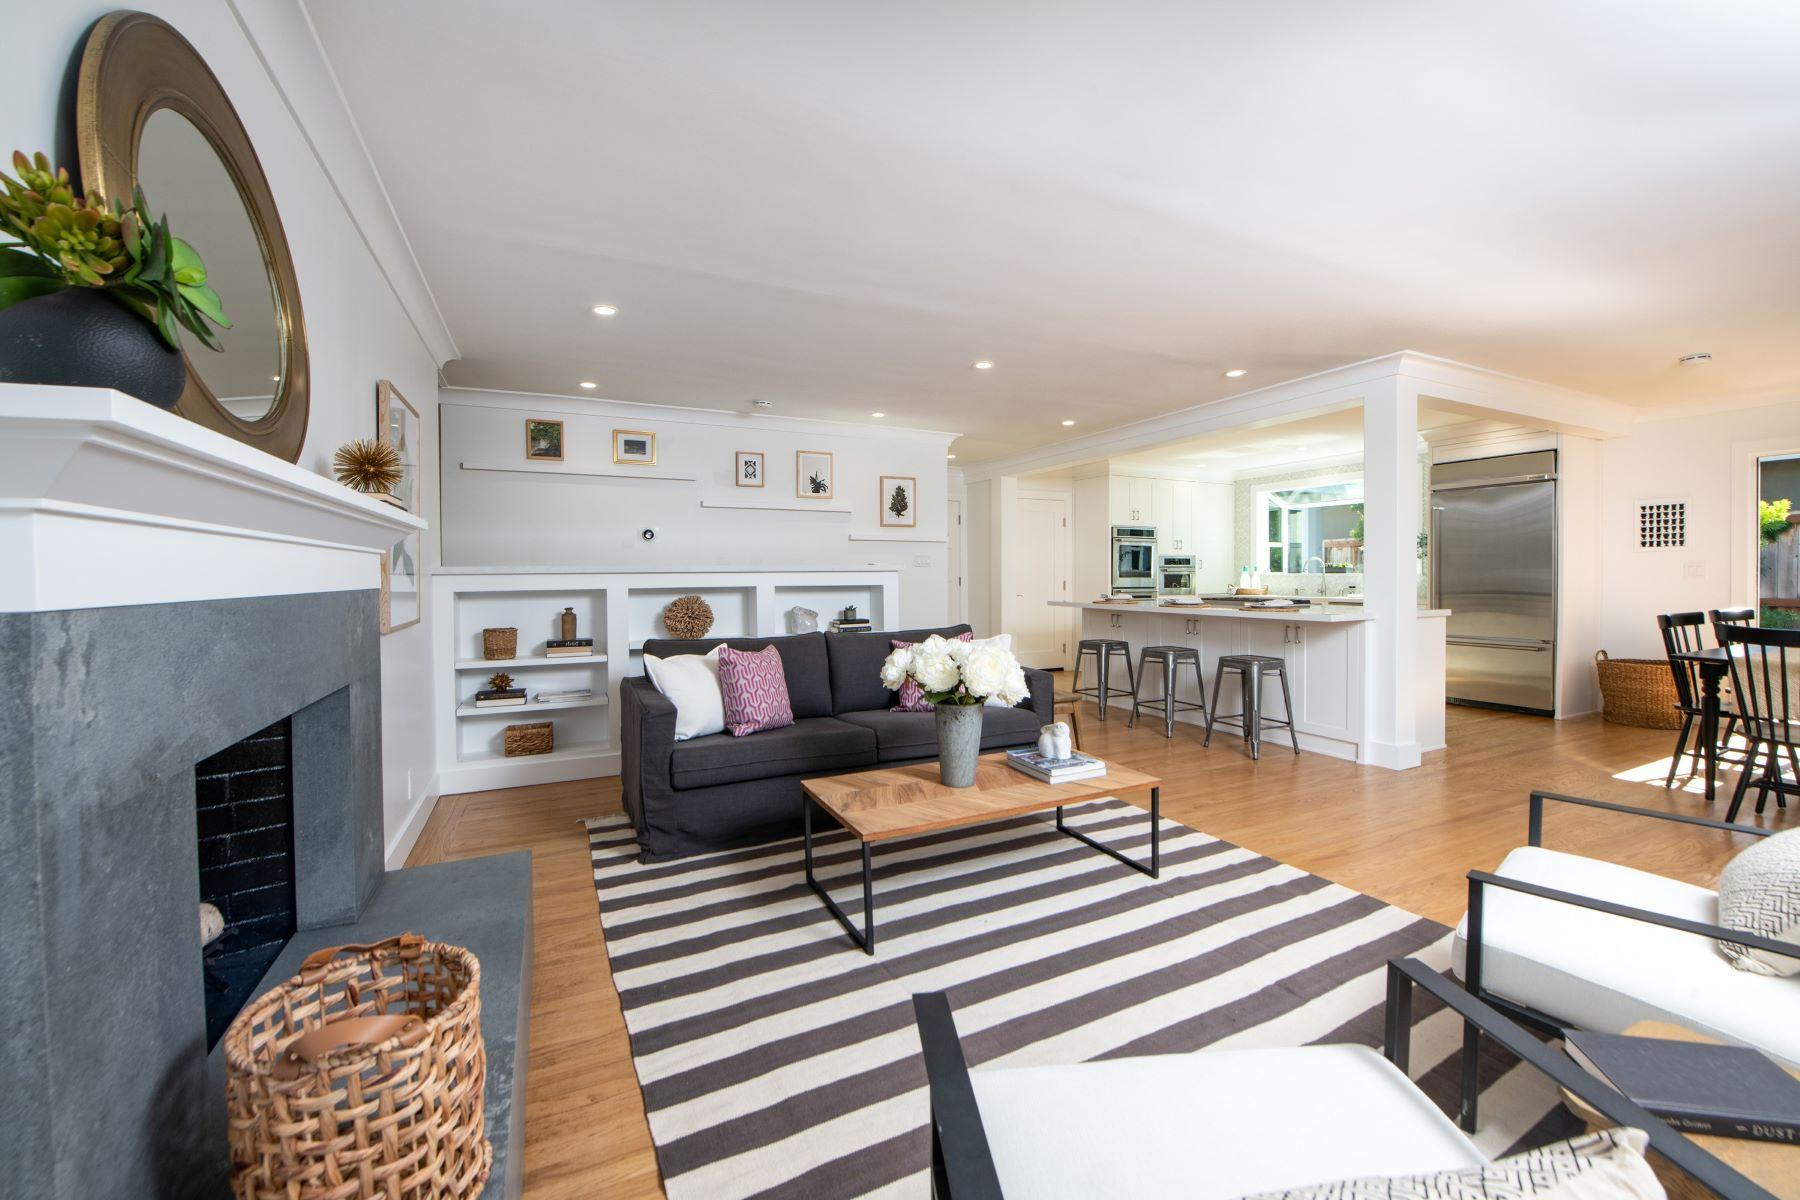 Single Family Homes for Sale at Beautiful Remodel in Corte Madera 18 Tamal Vista Blvd. Corte Madera, California 94925 United States